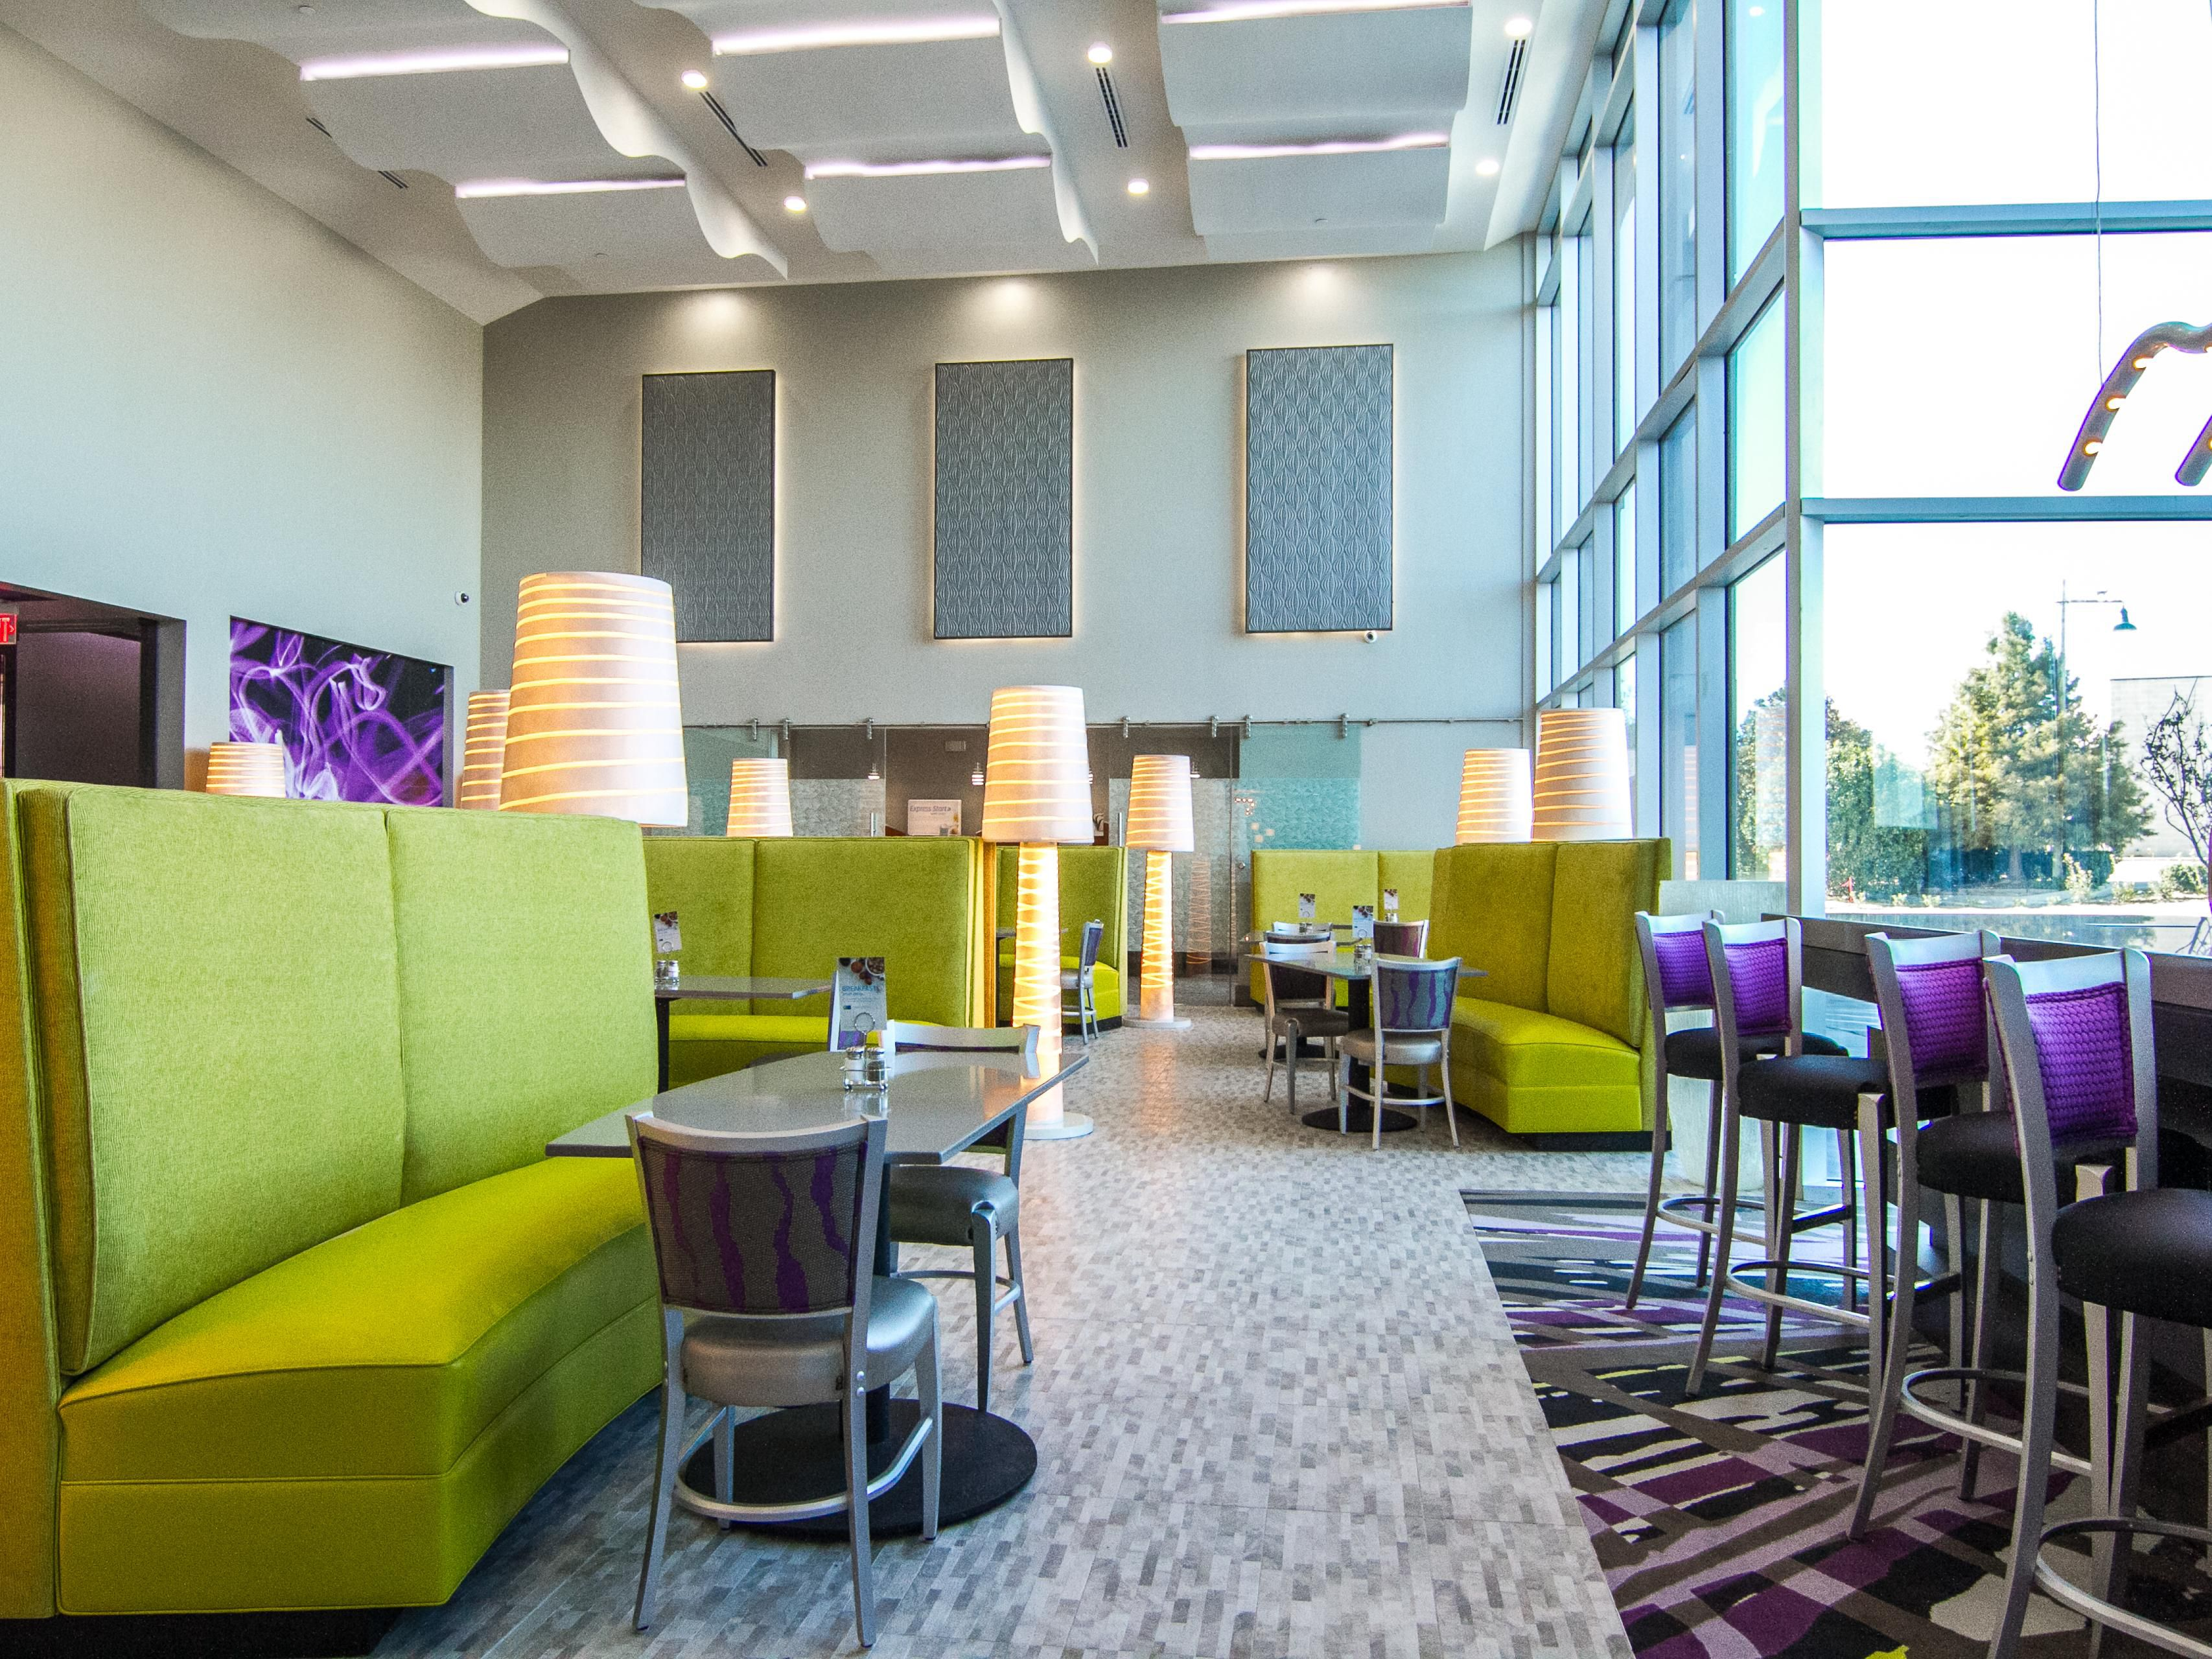 Holiday Inn Express & Suites Garland E - Lake Hubbard I30 Hotel by IHG